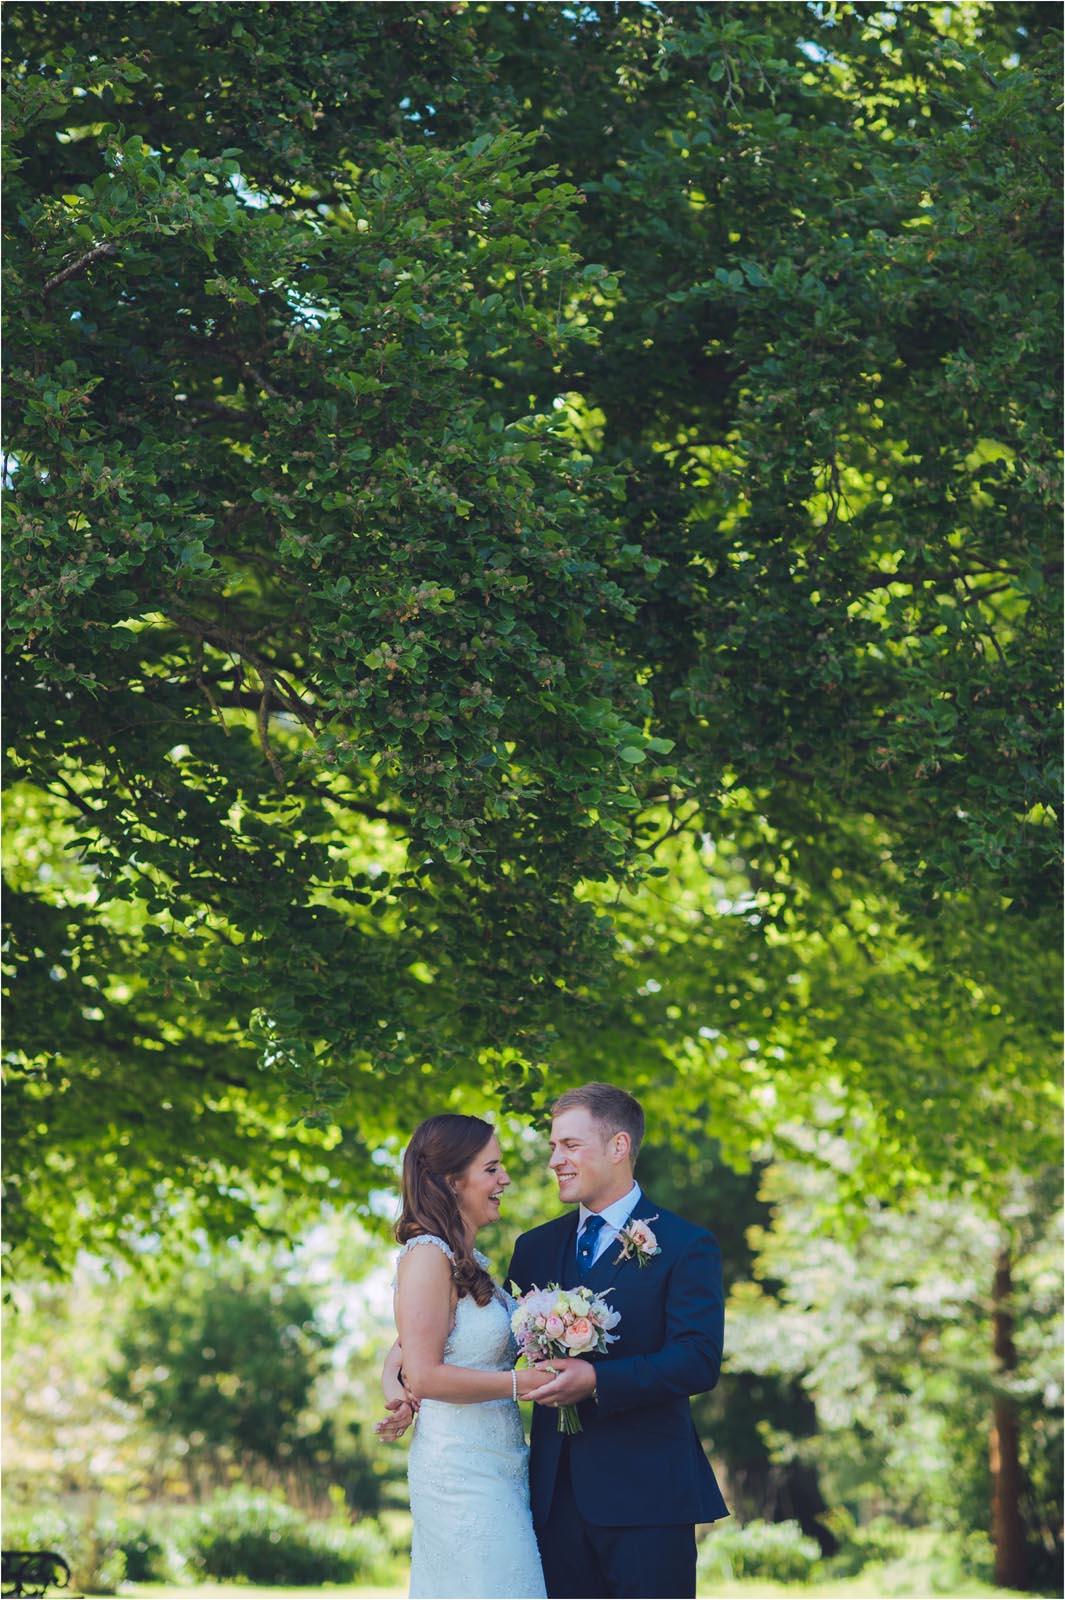 Simon biffen wedding photography 0106